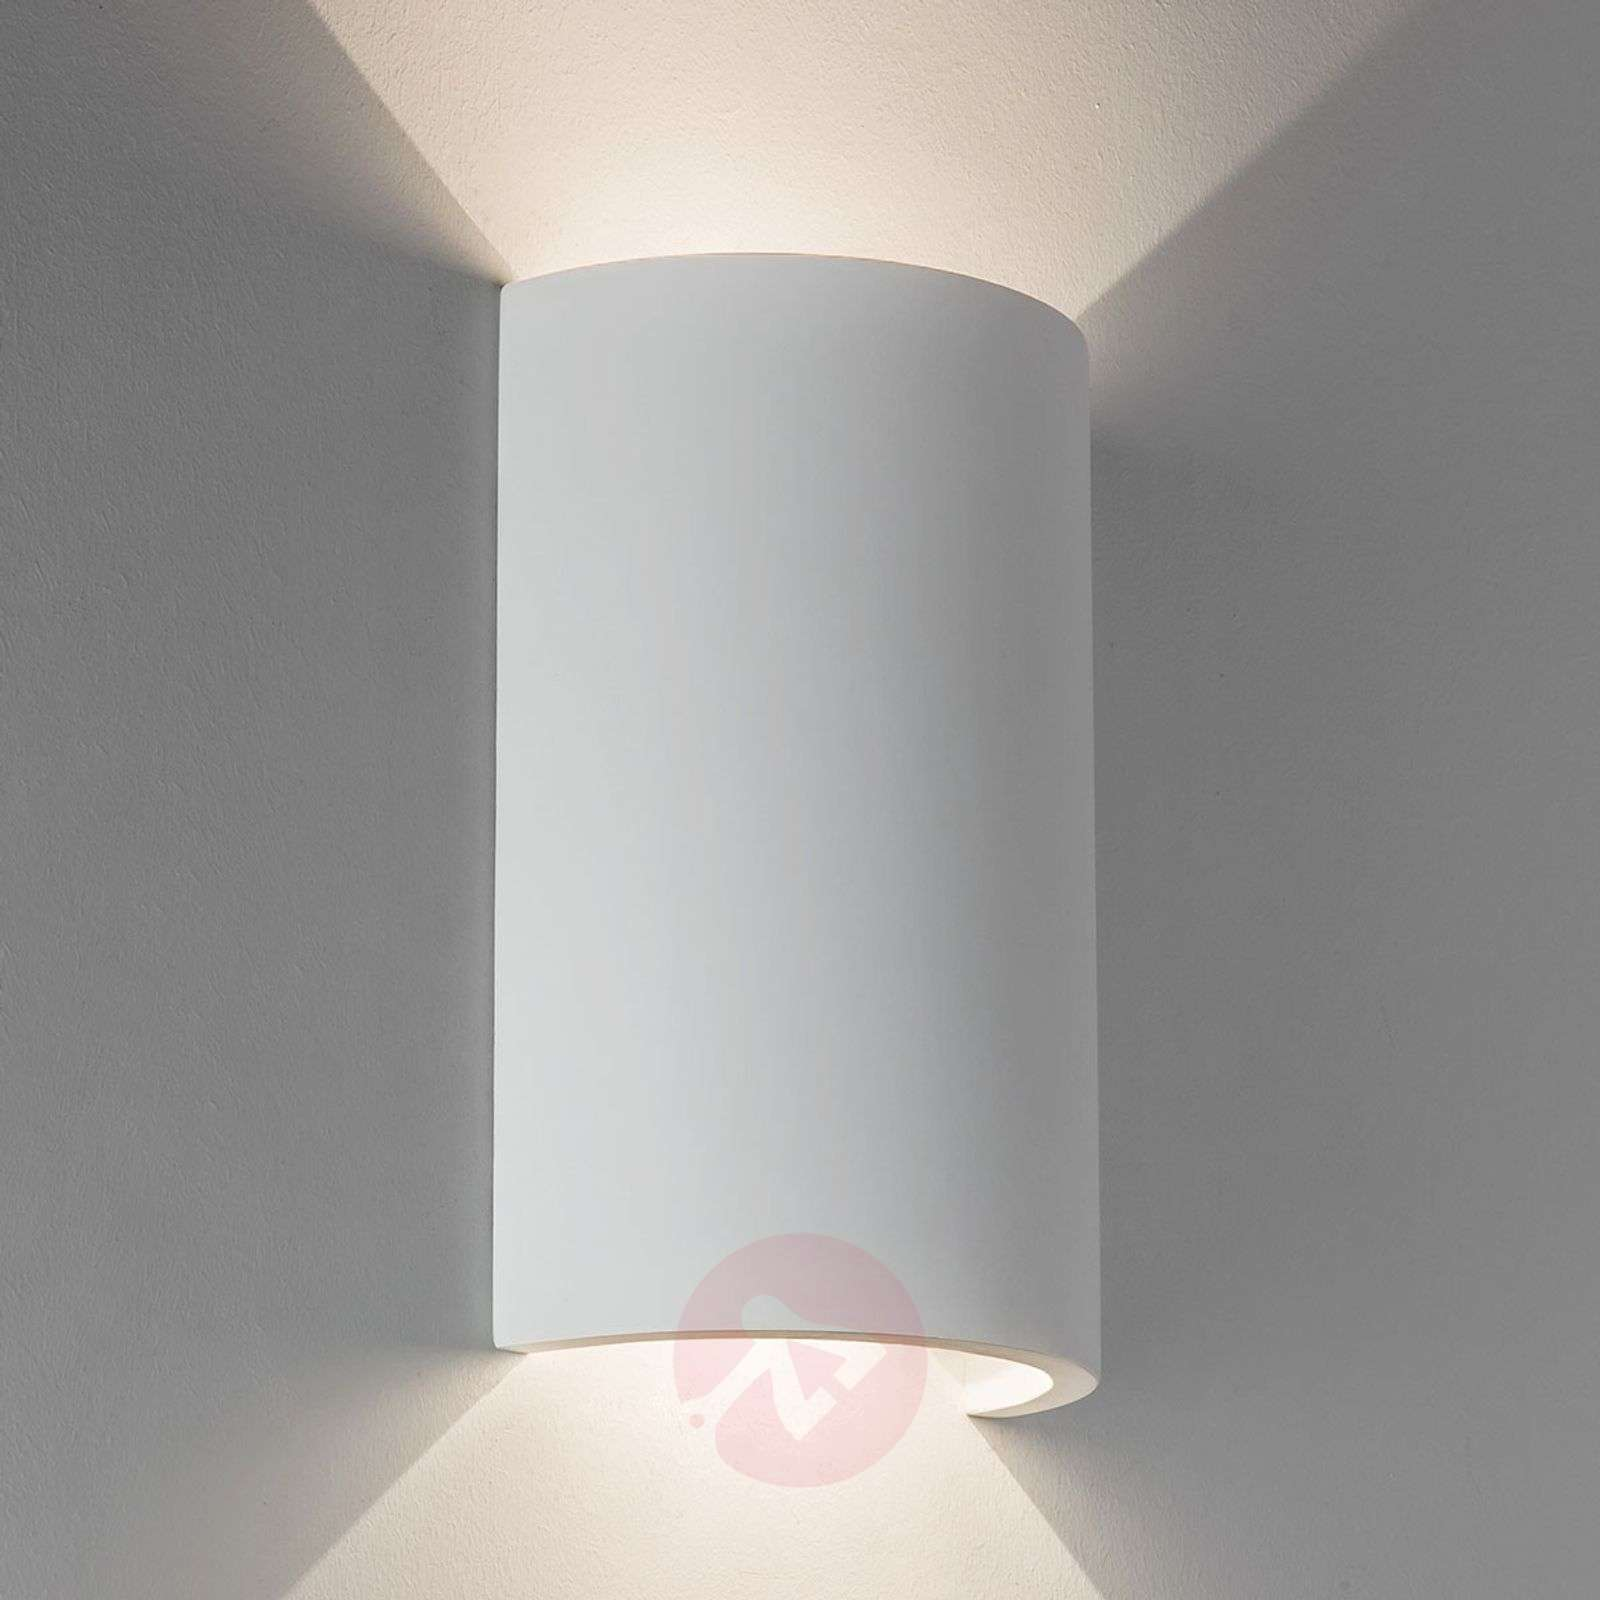 Paintable Serifos LED wall light 170, plaster-1020588-01